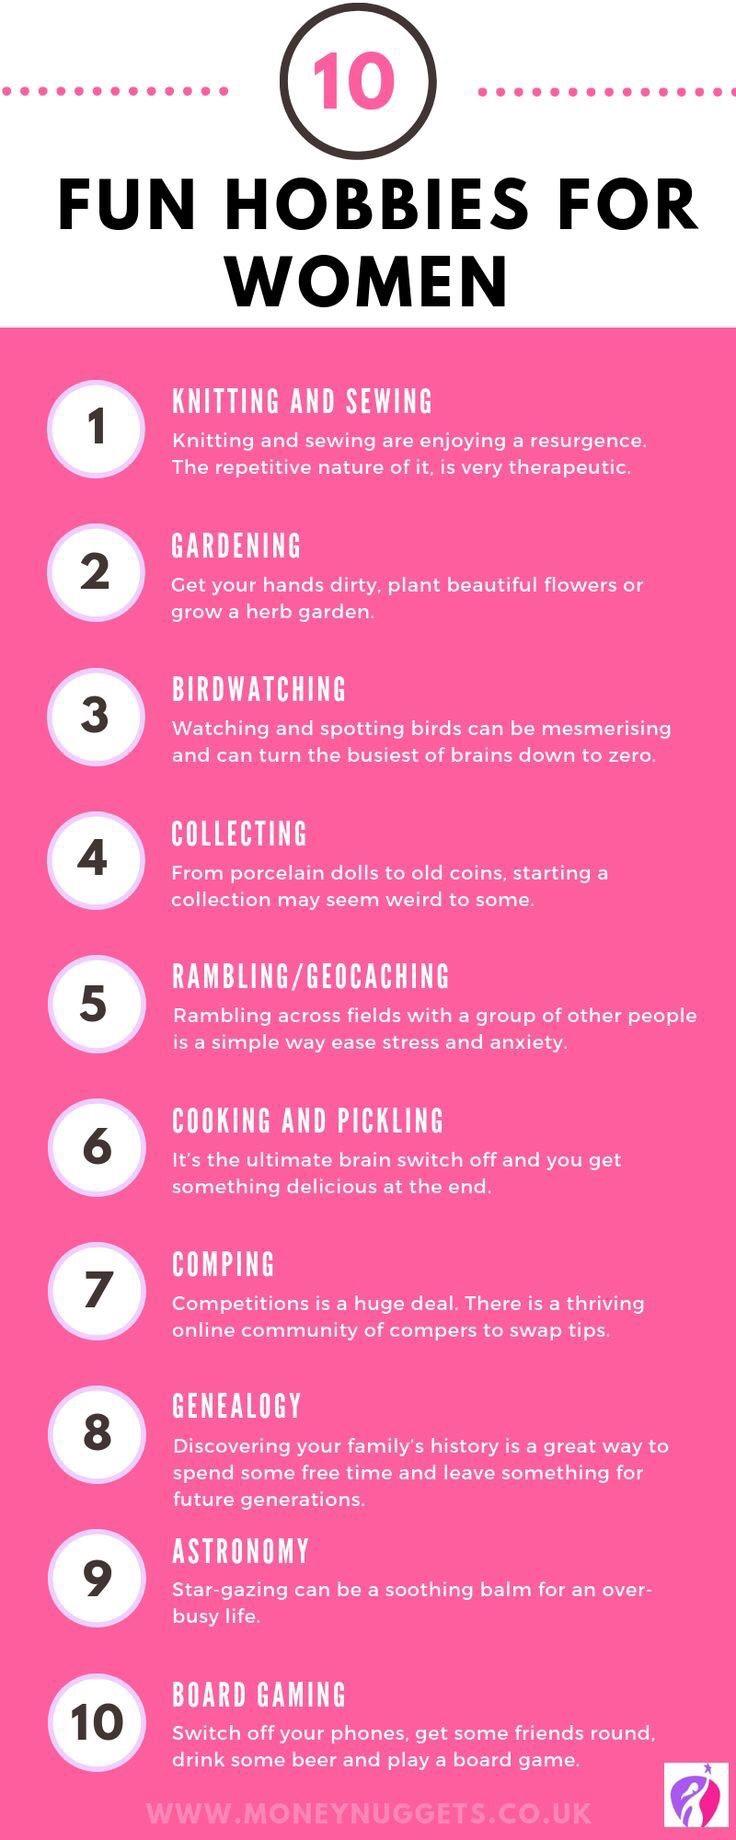 Ten Hobbies For Women You Can Enjoy From Home Back Pain Blog Uk